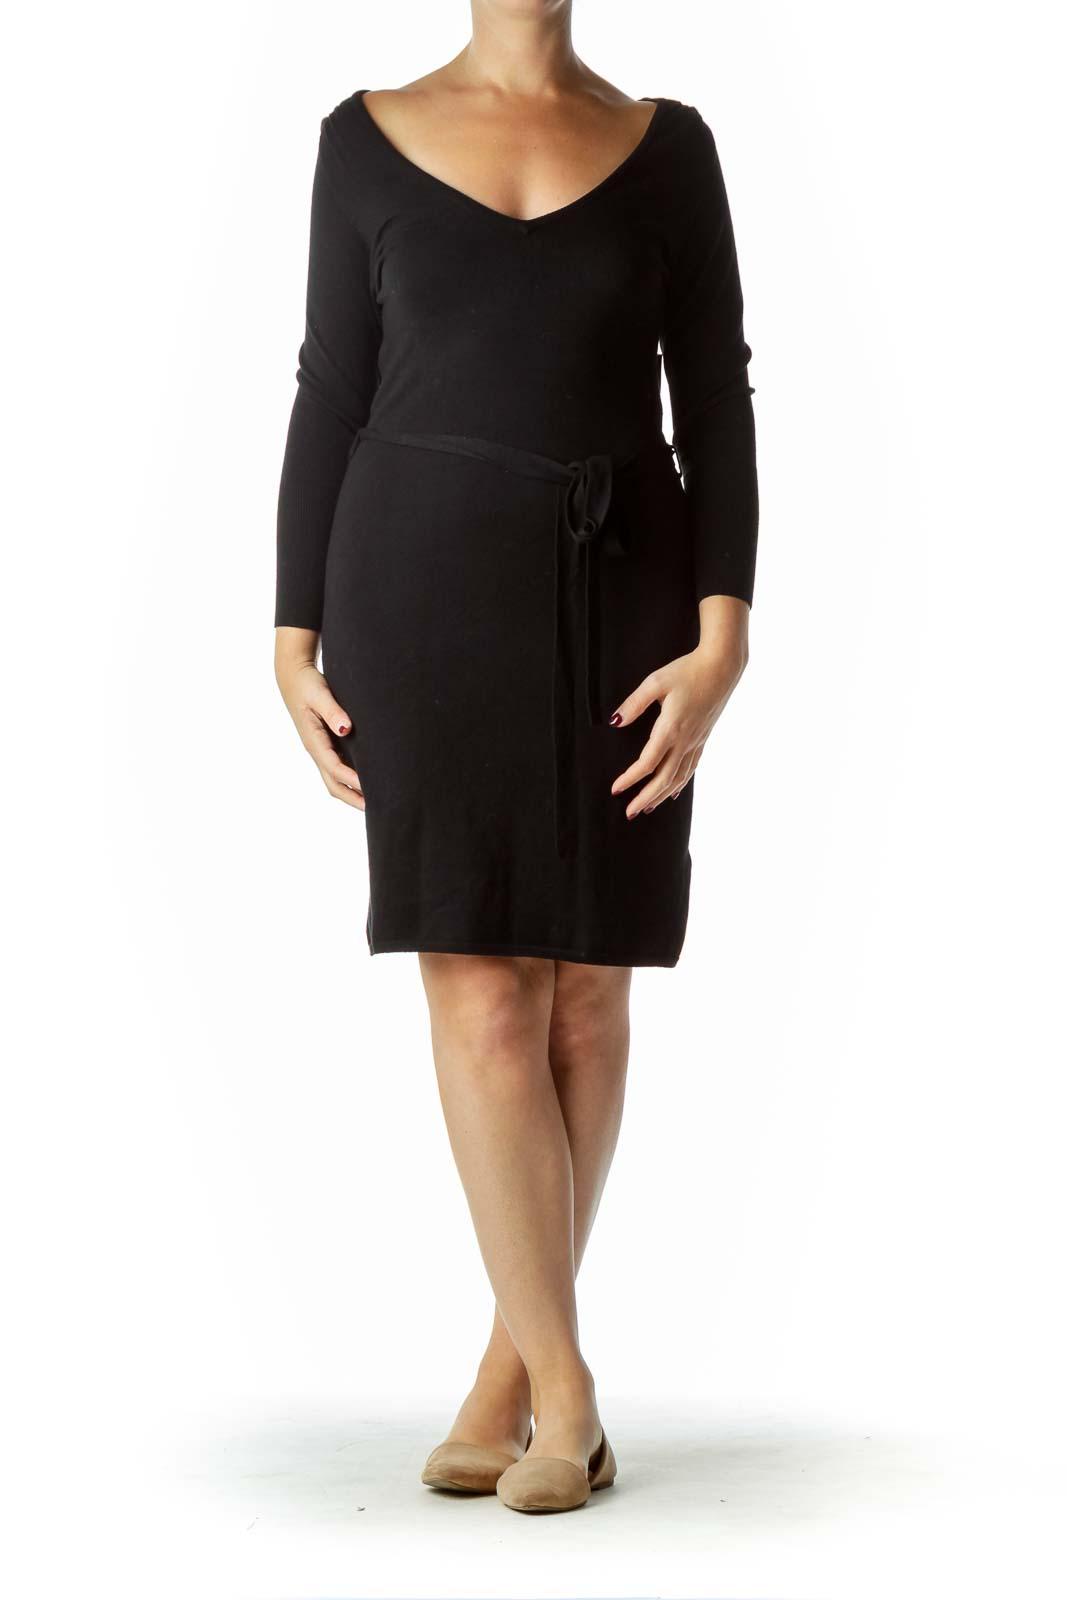 Black Long Sleeve Knit Dress